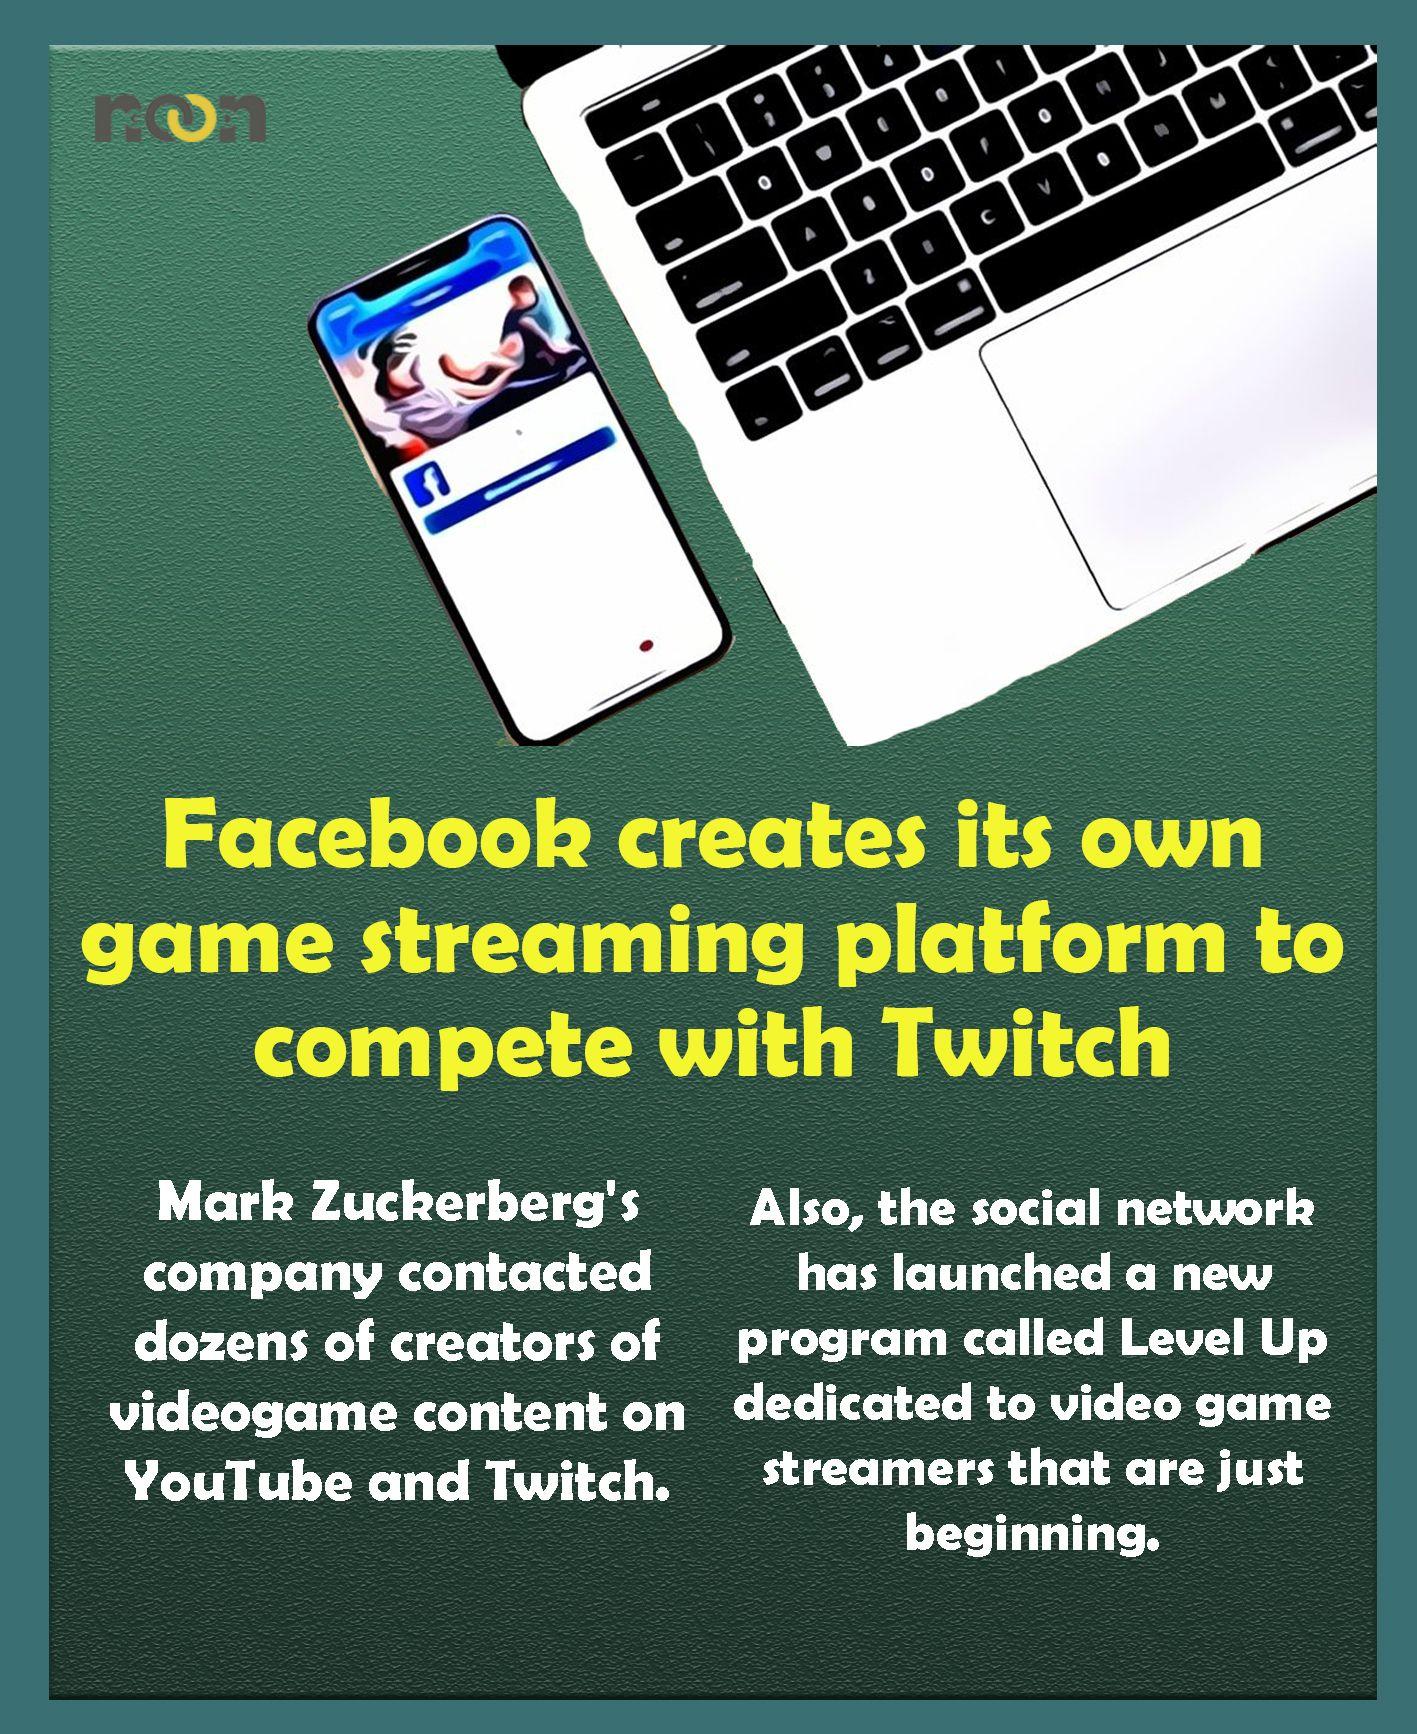 When Tech Companies Compete On Platform